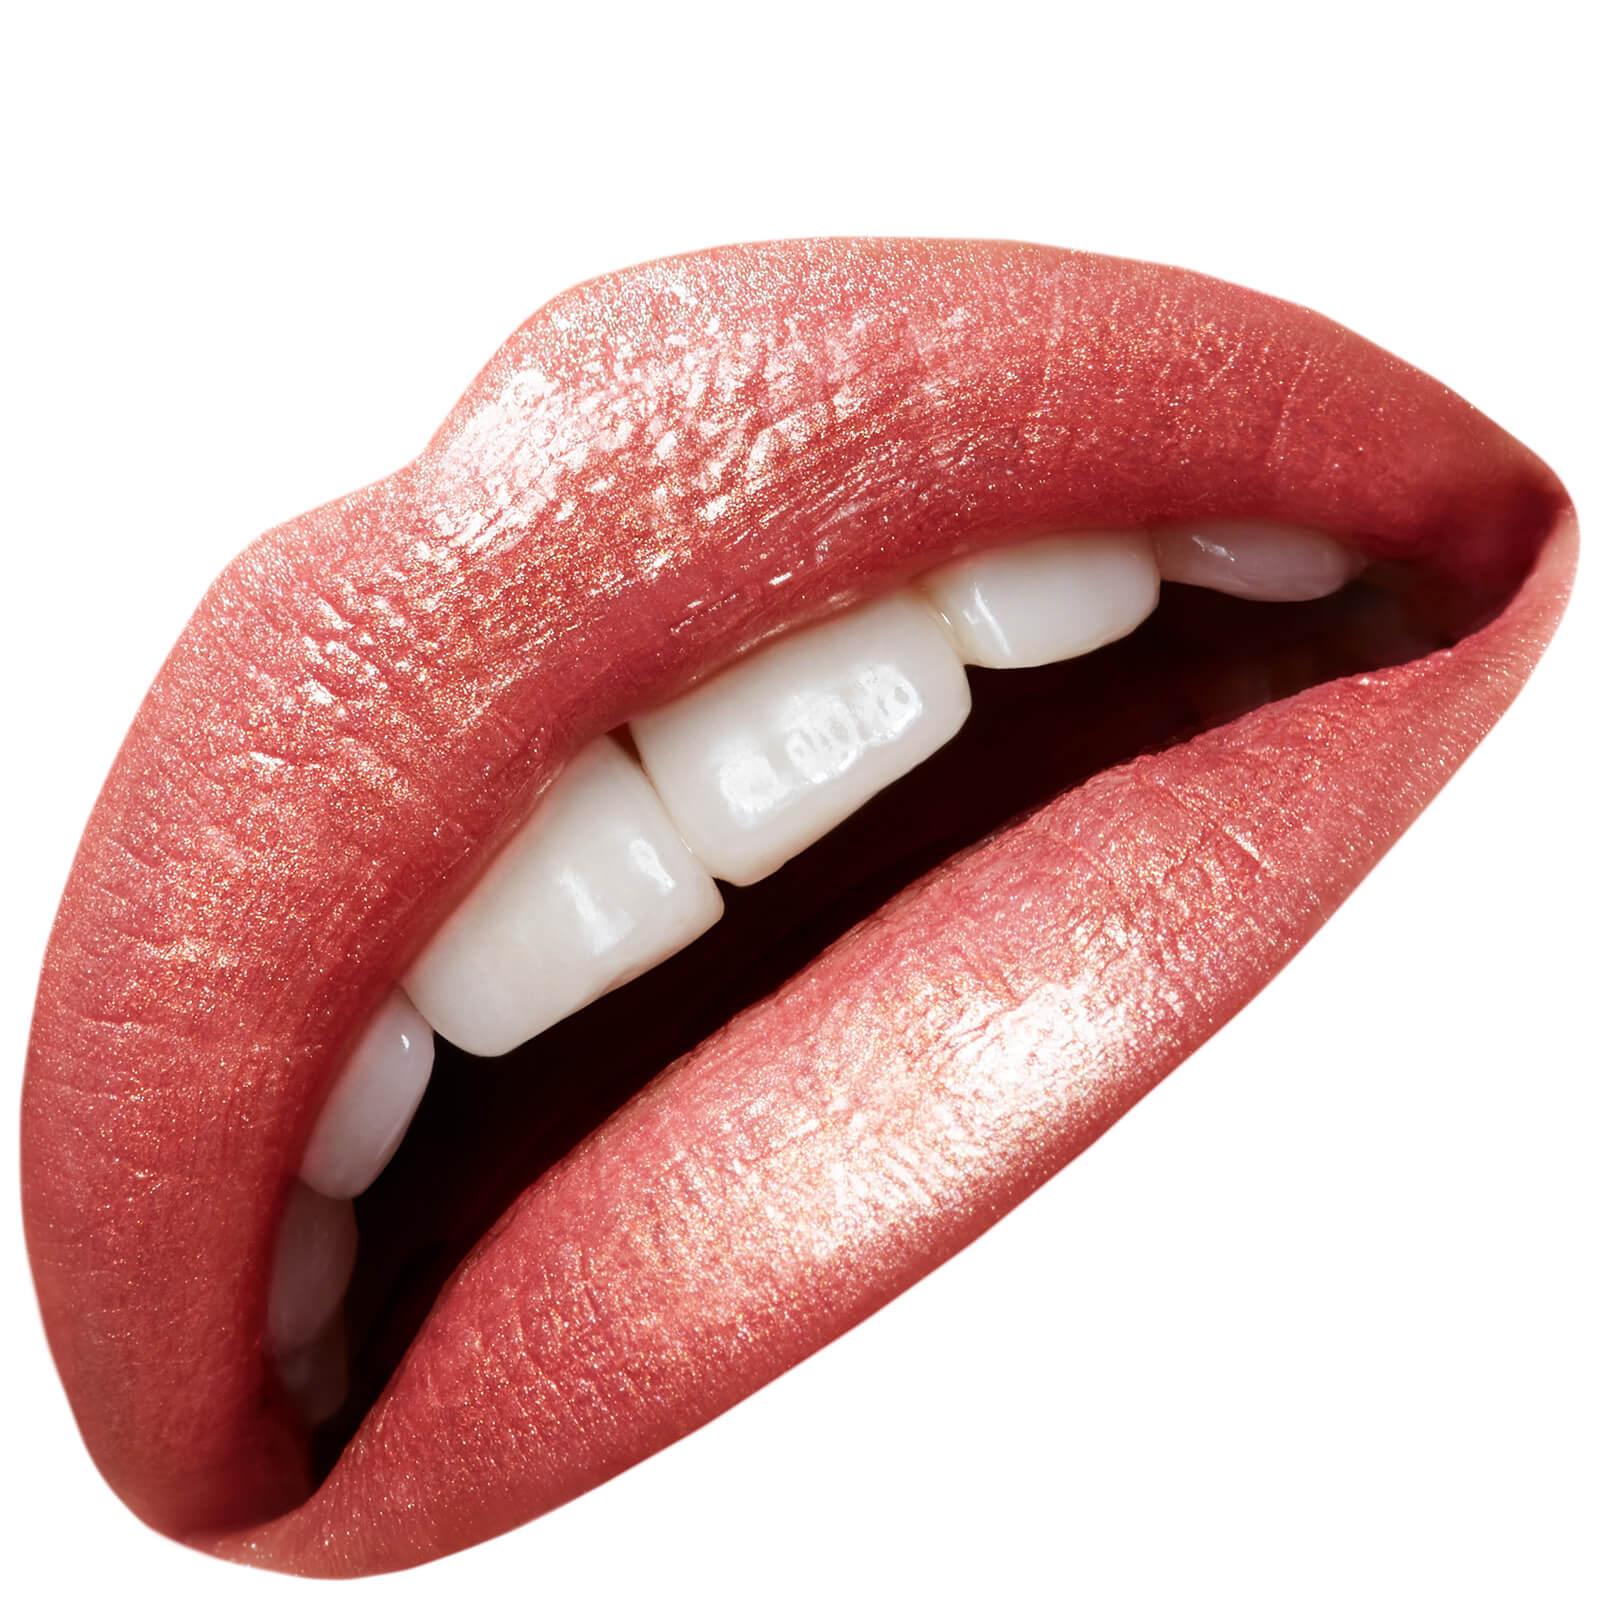 INC.redible Rouge à Lèvres Shine a Light on Me INC.redible (plusieurs teintes disponibles) - Basically Extra